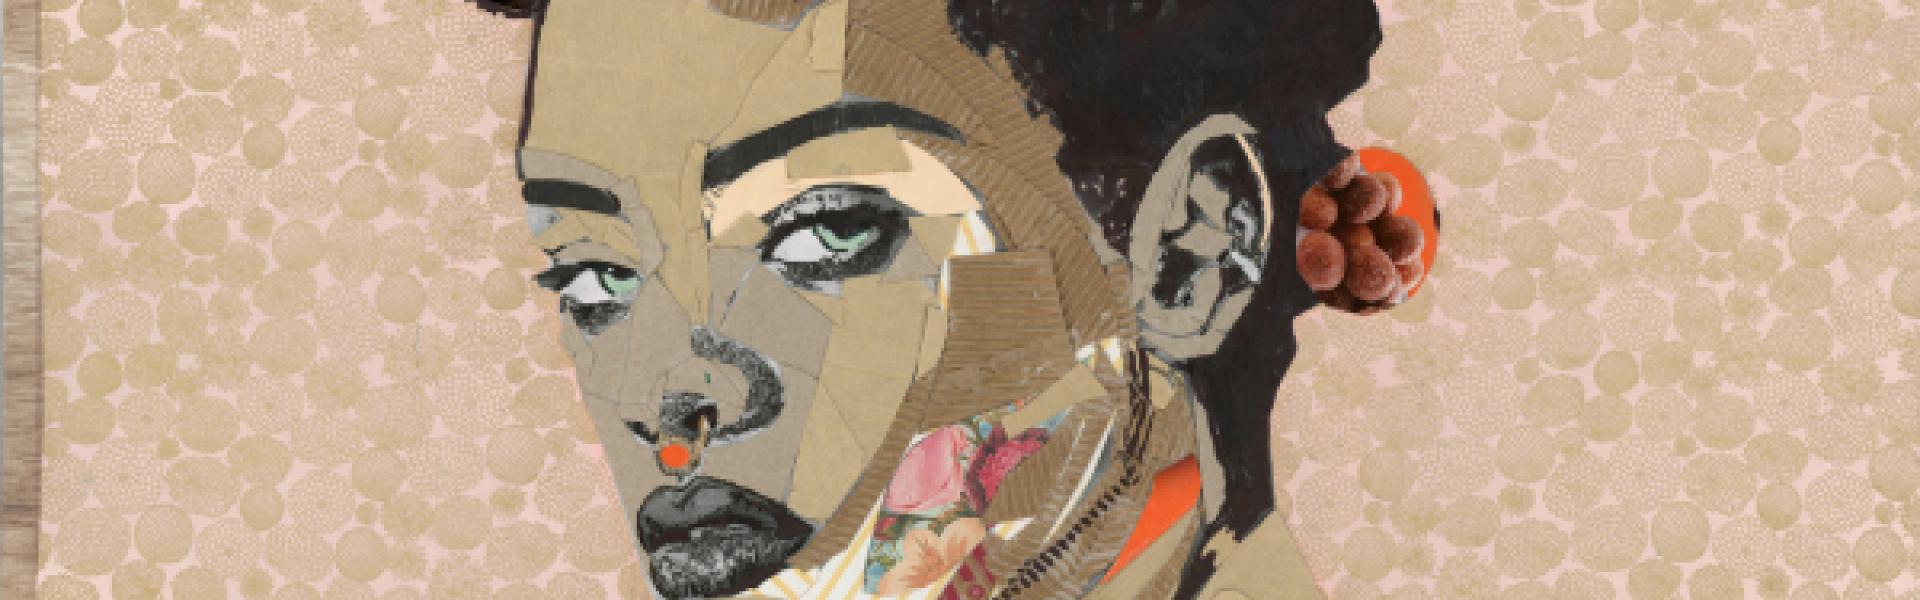 banner_Rihanna-1500px.20200620143650.jpg